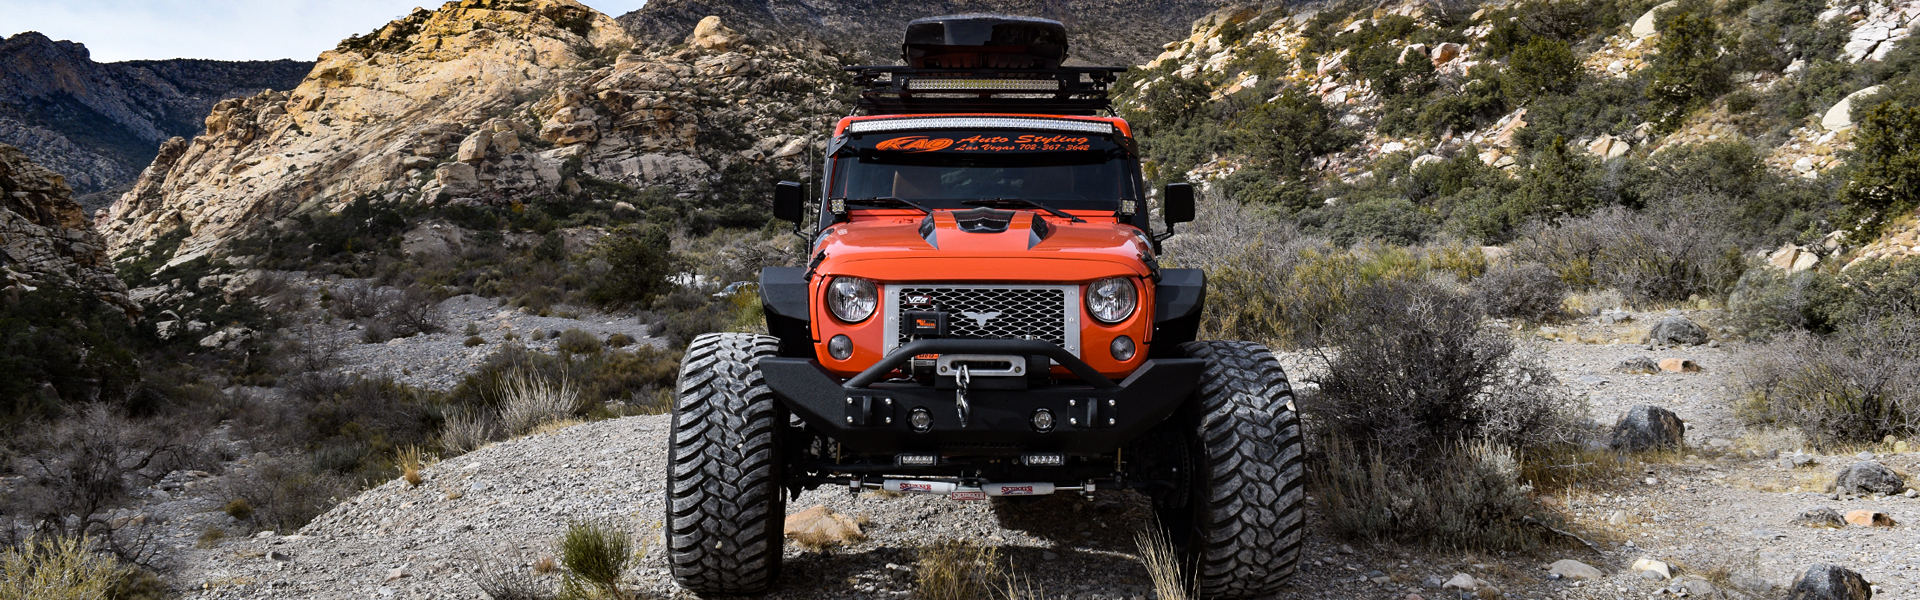 H700 Affliction 24x14 Hardrock Offroad Wheels Jeep Wrangler